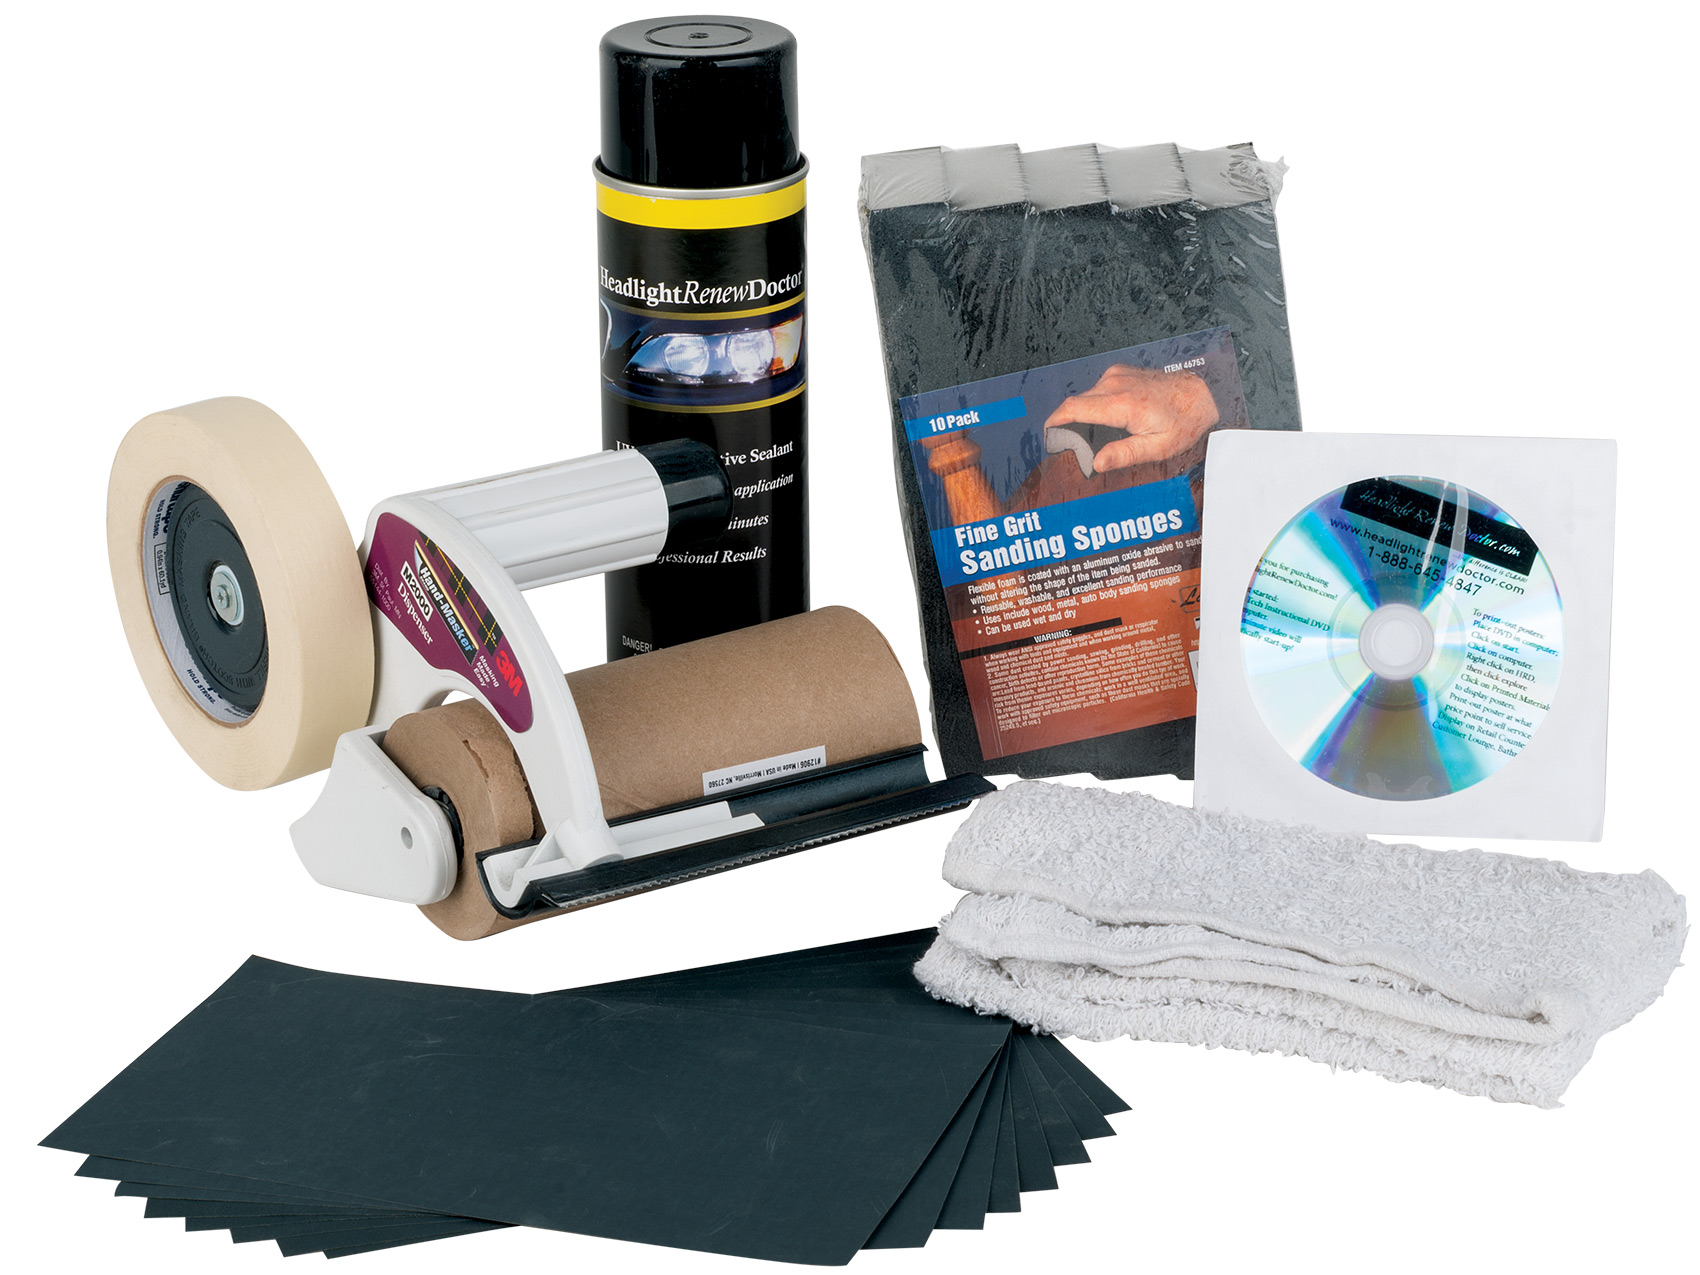 Headlight Restoration Product Showcase